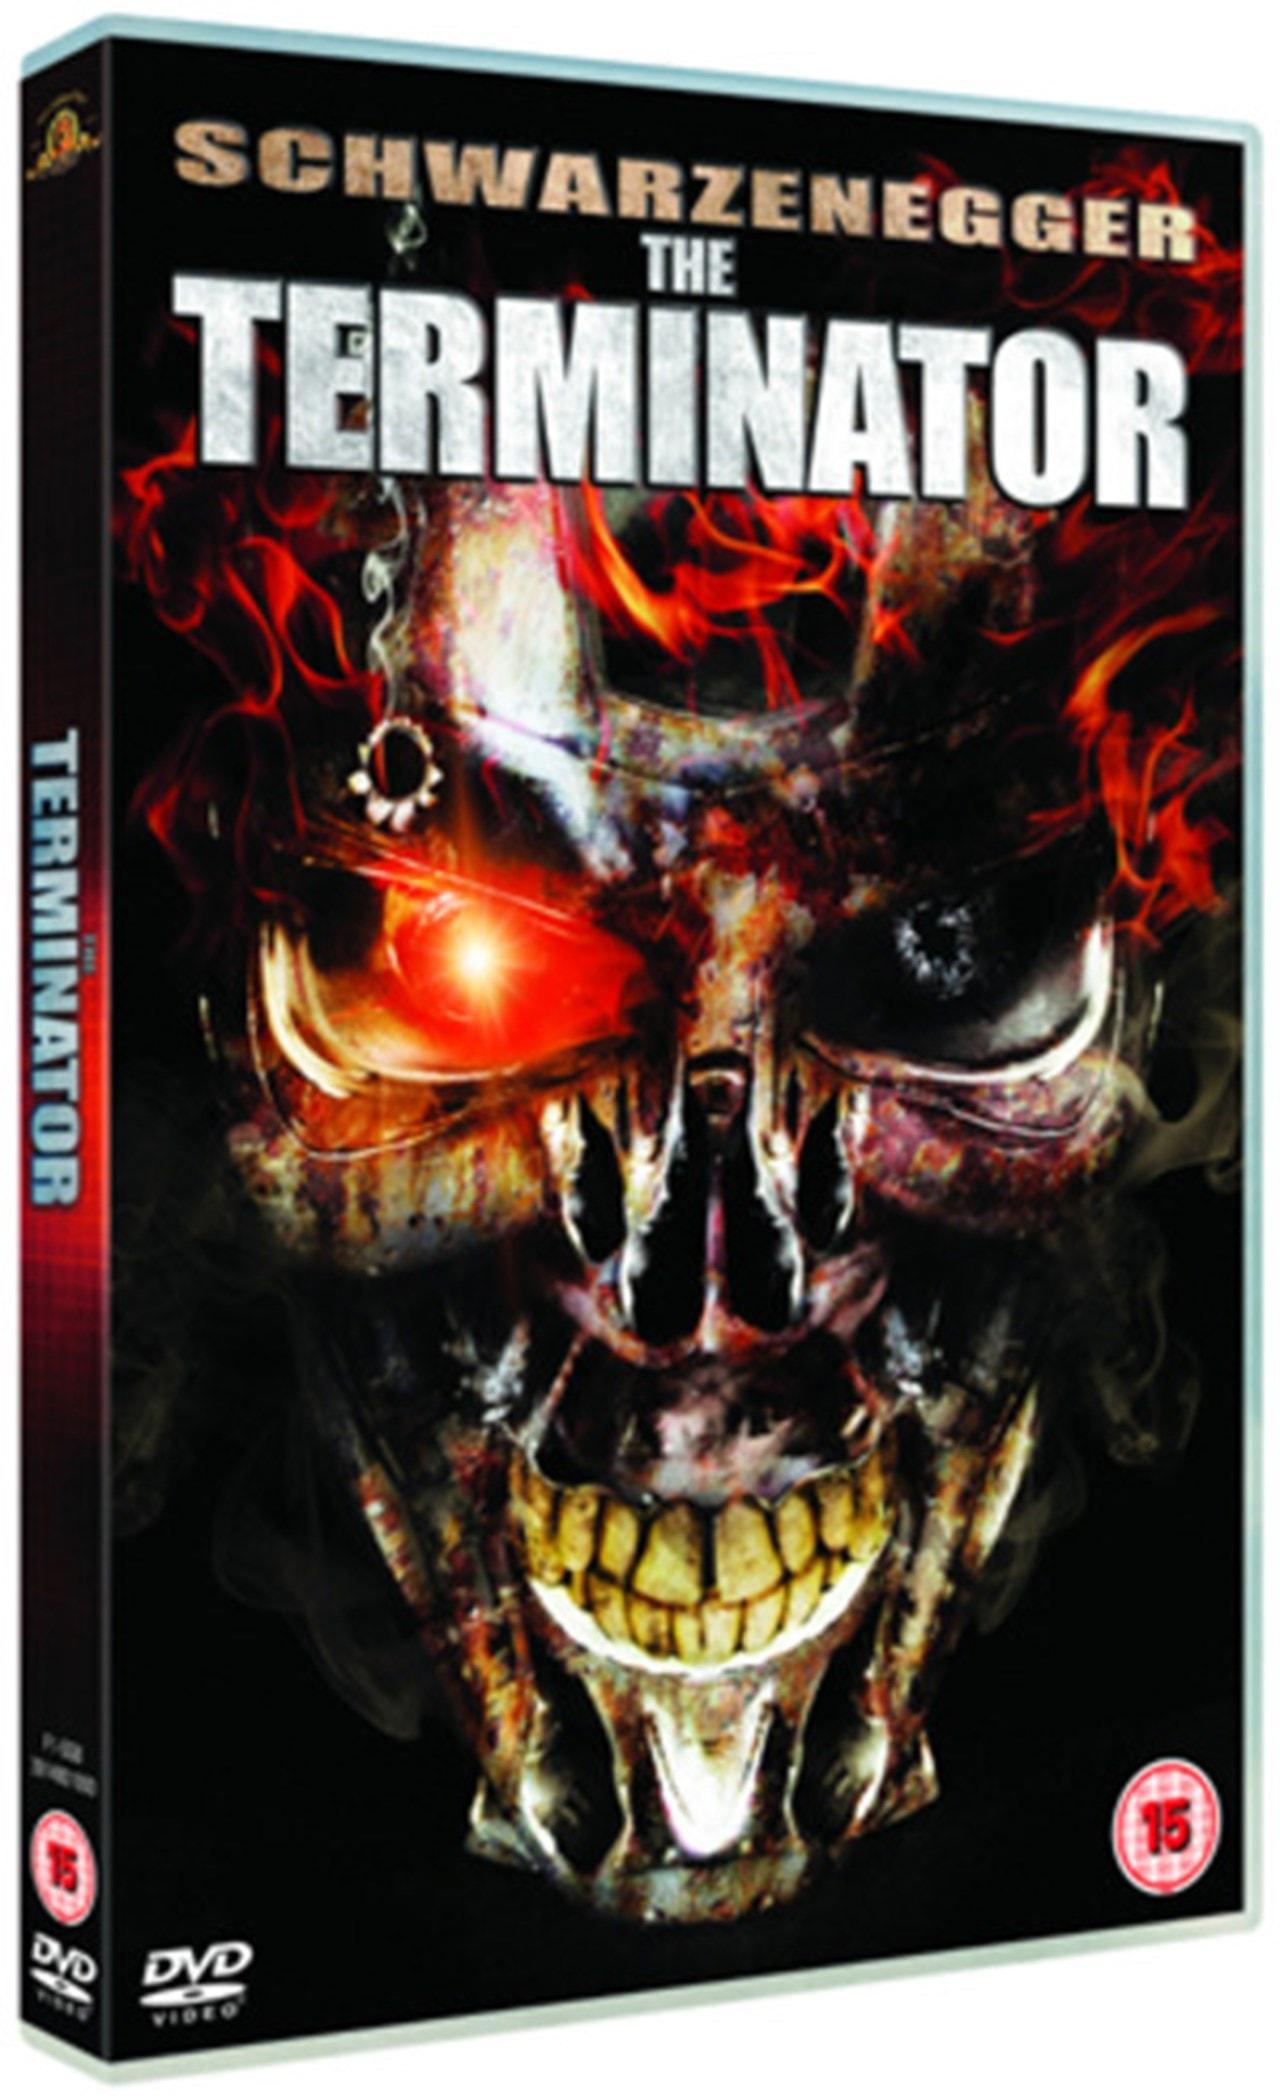 The Terminator - 1